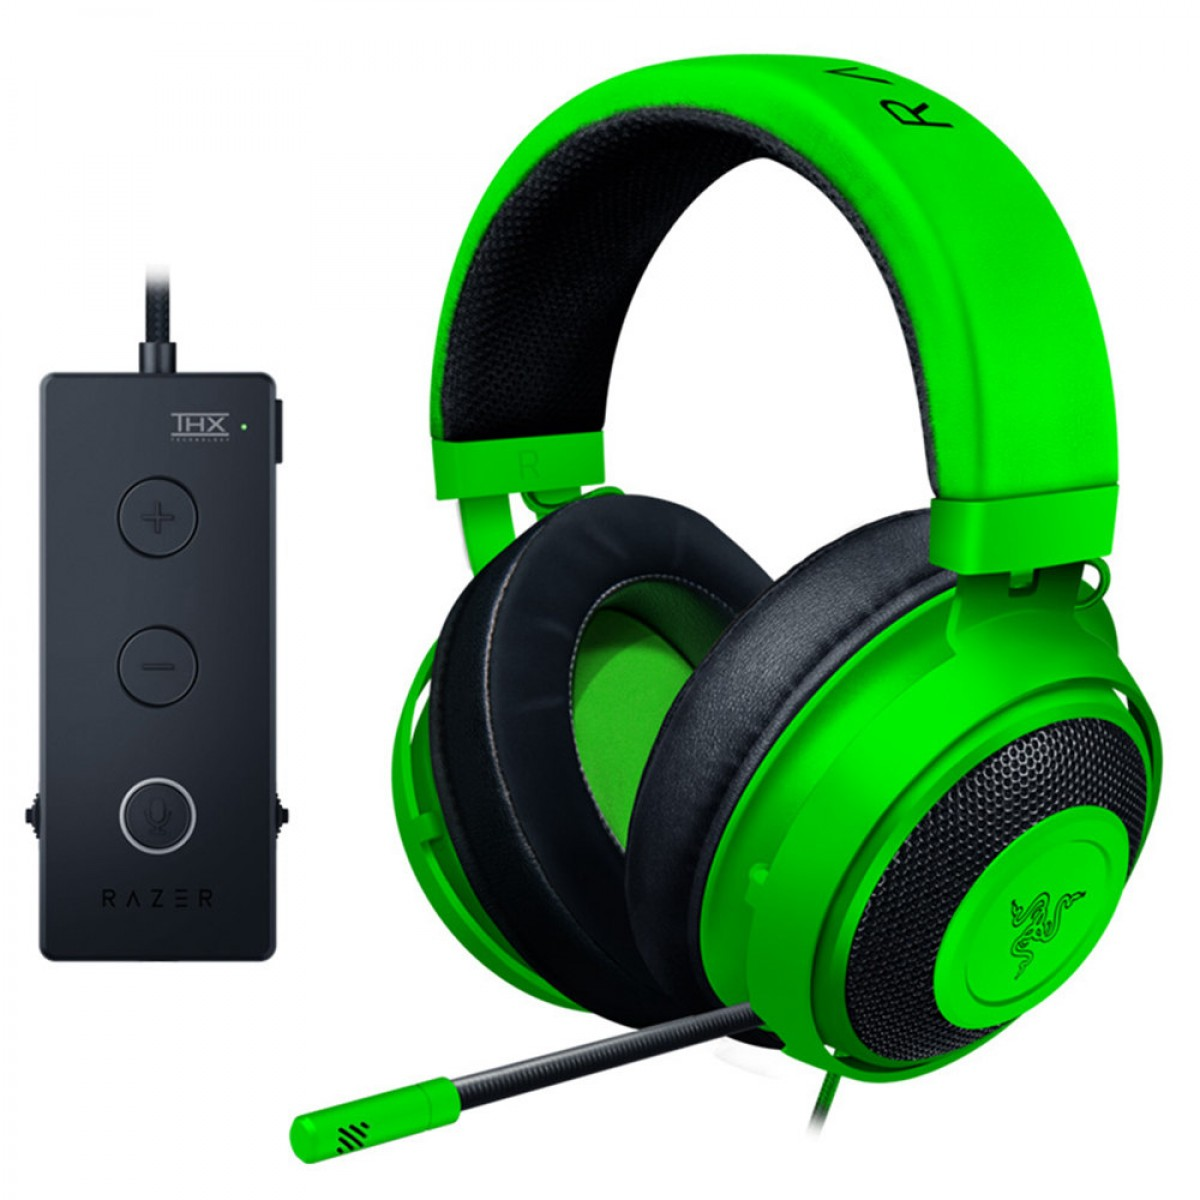 Razer kraken Tournament Gaming Headset -Green